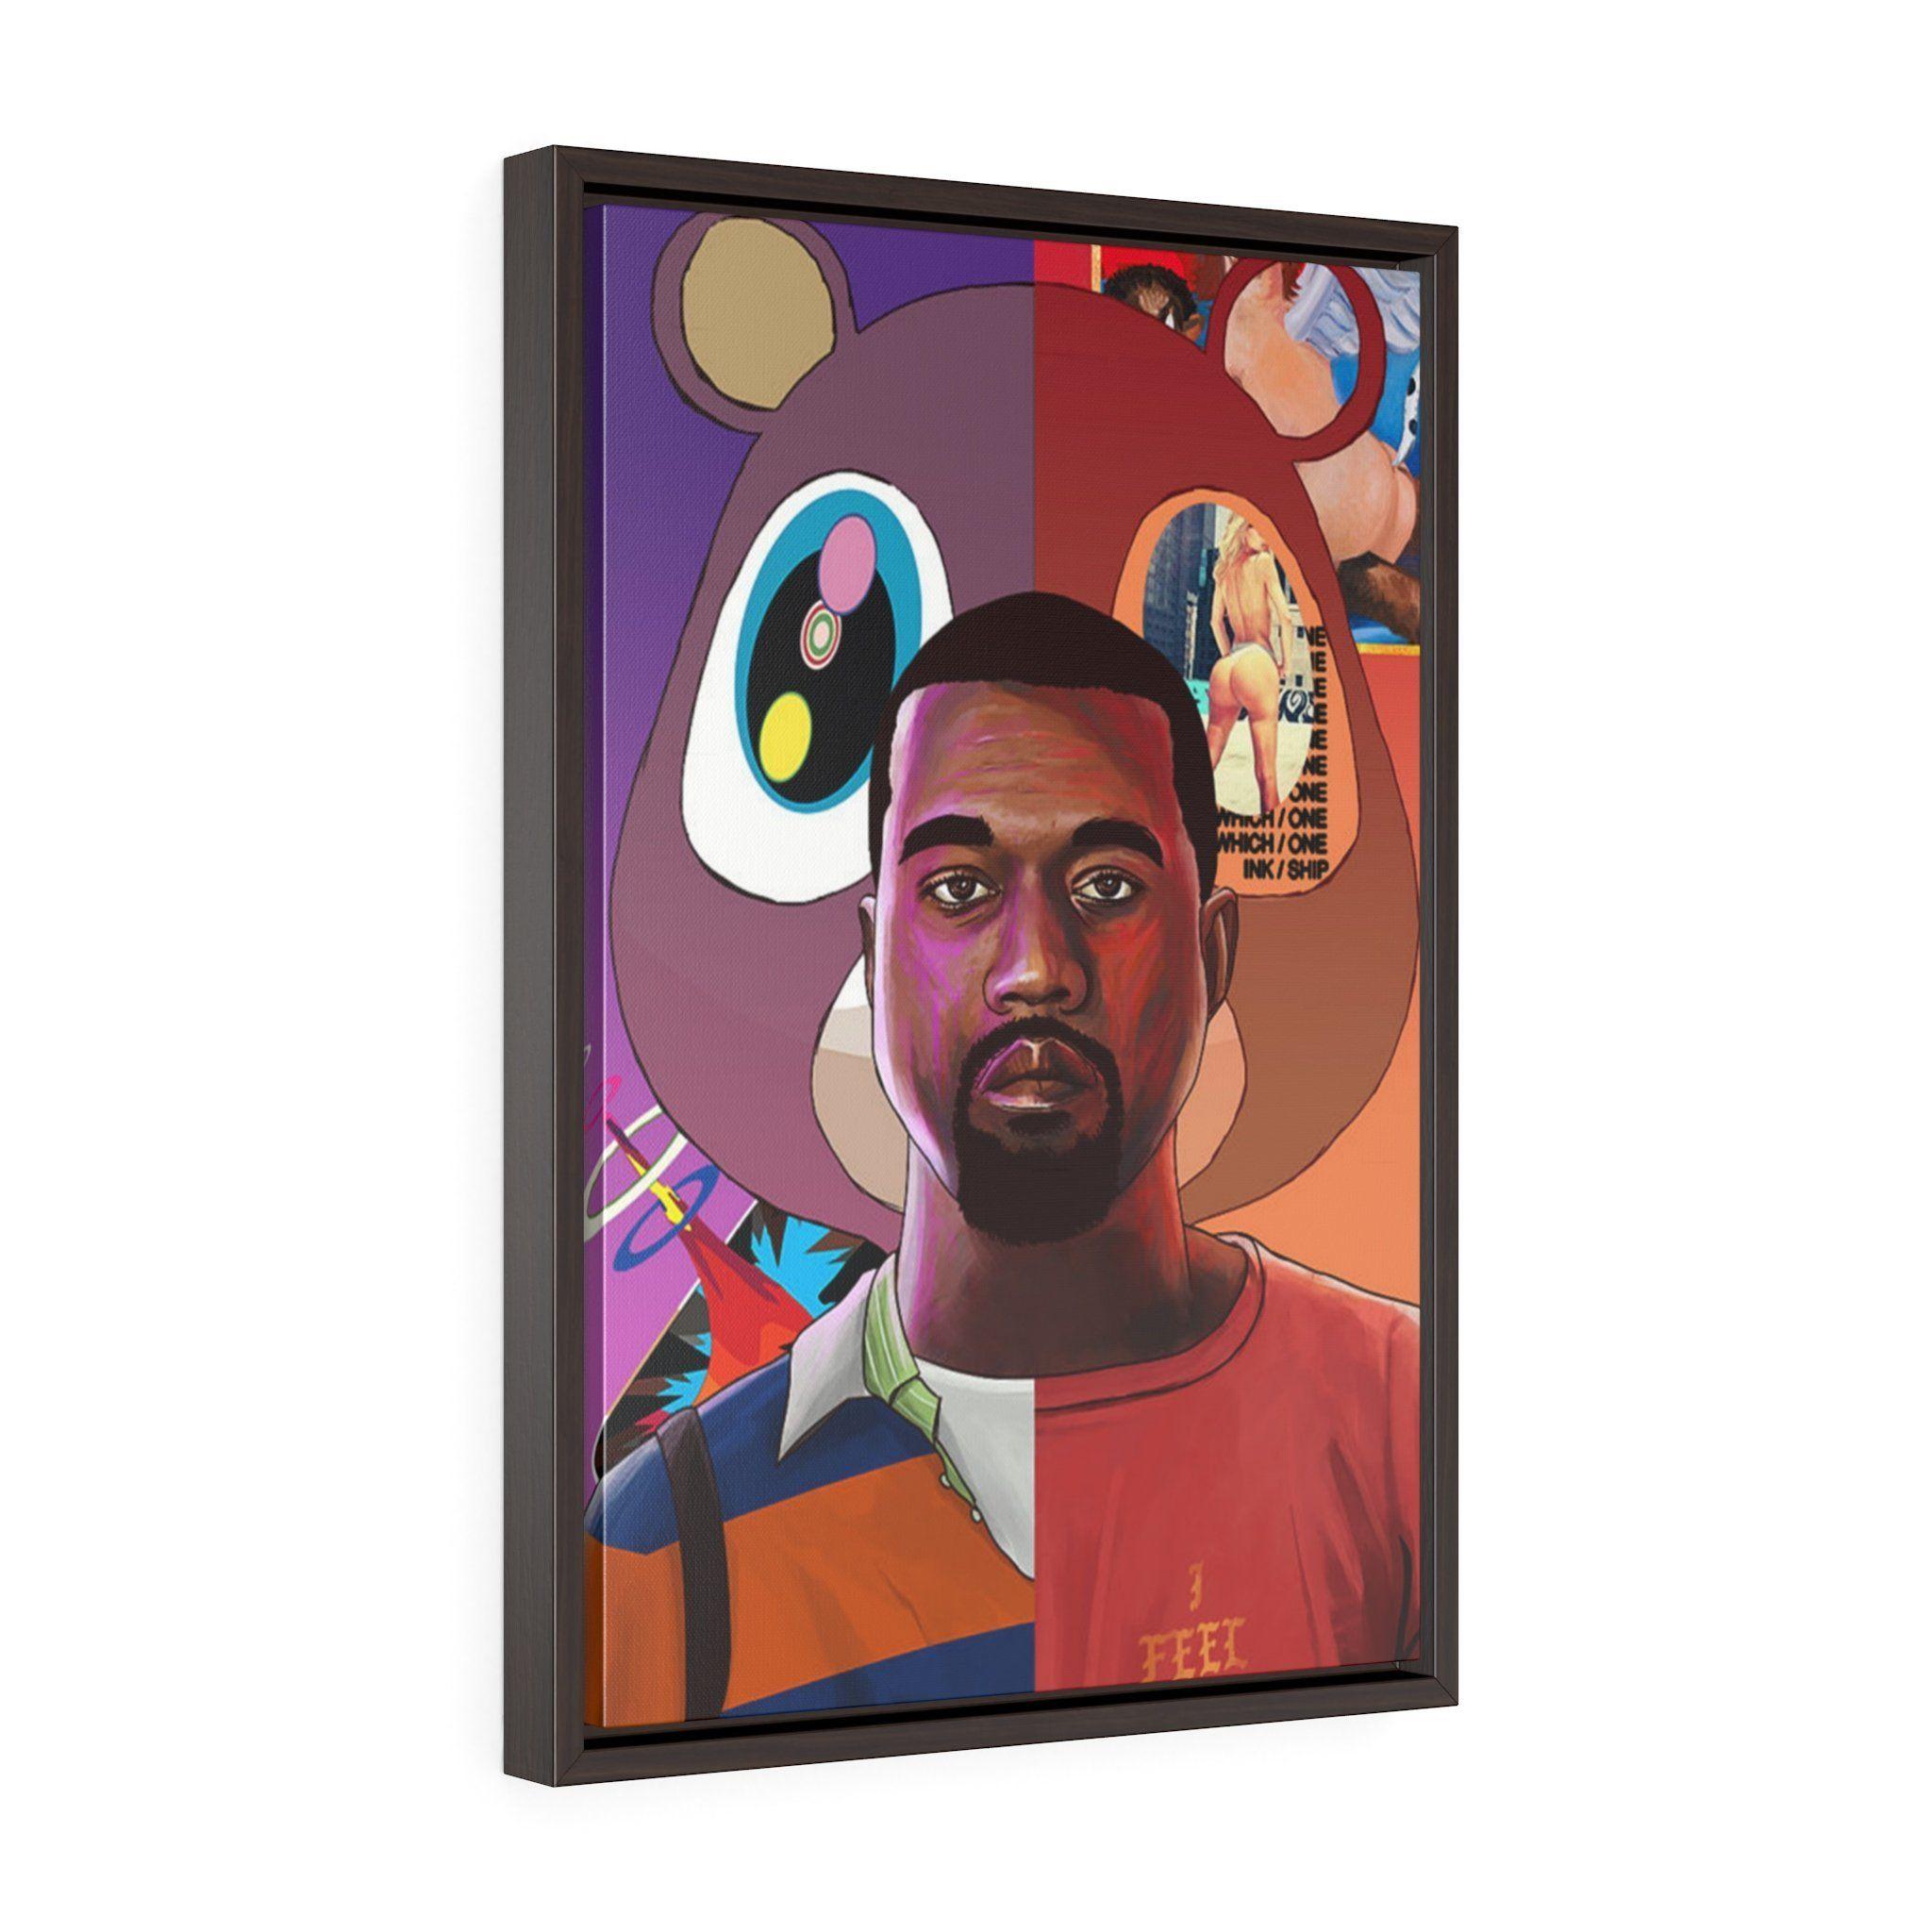 Kanye West Framed Canvas Gallery Wrap Music Art Print Gallery Wrap Canvas Art